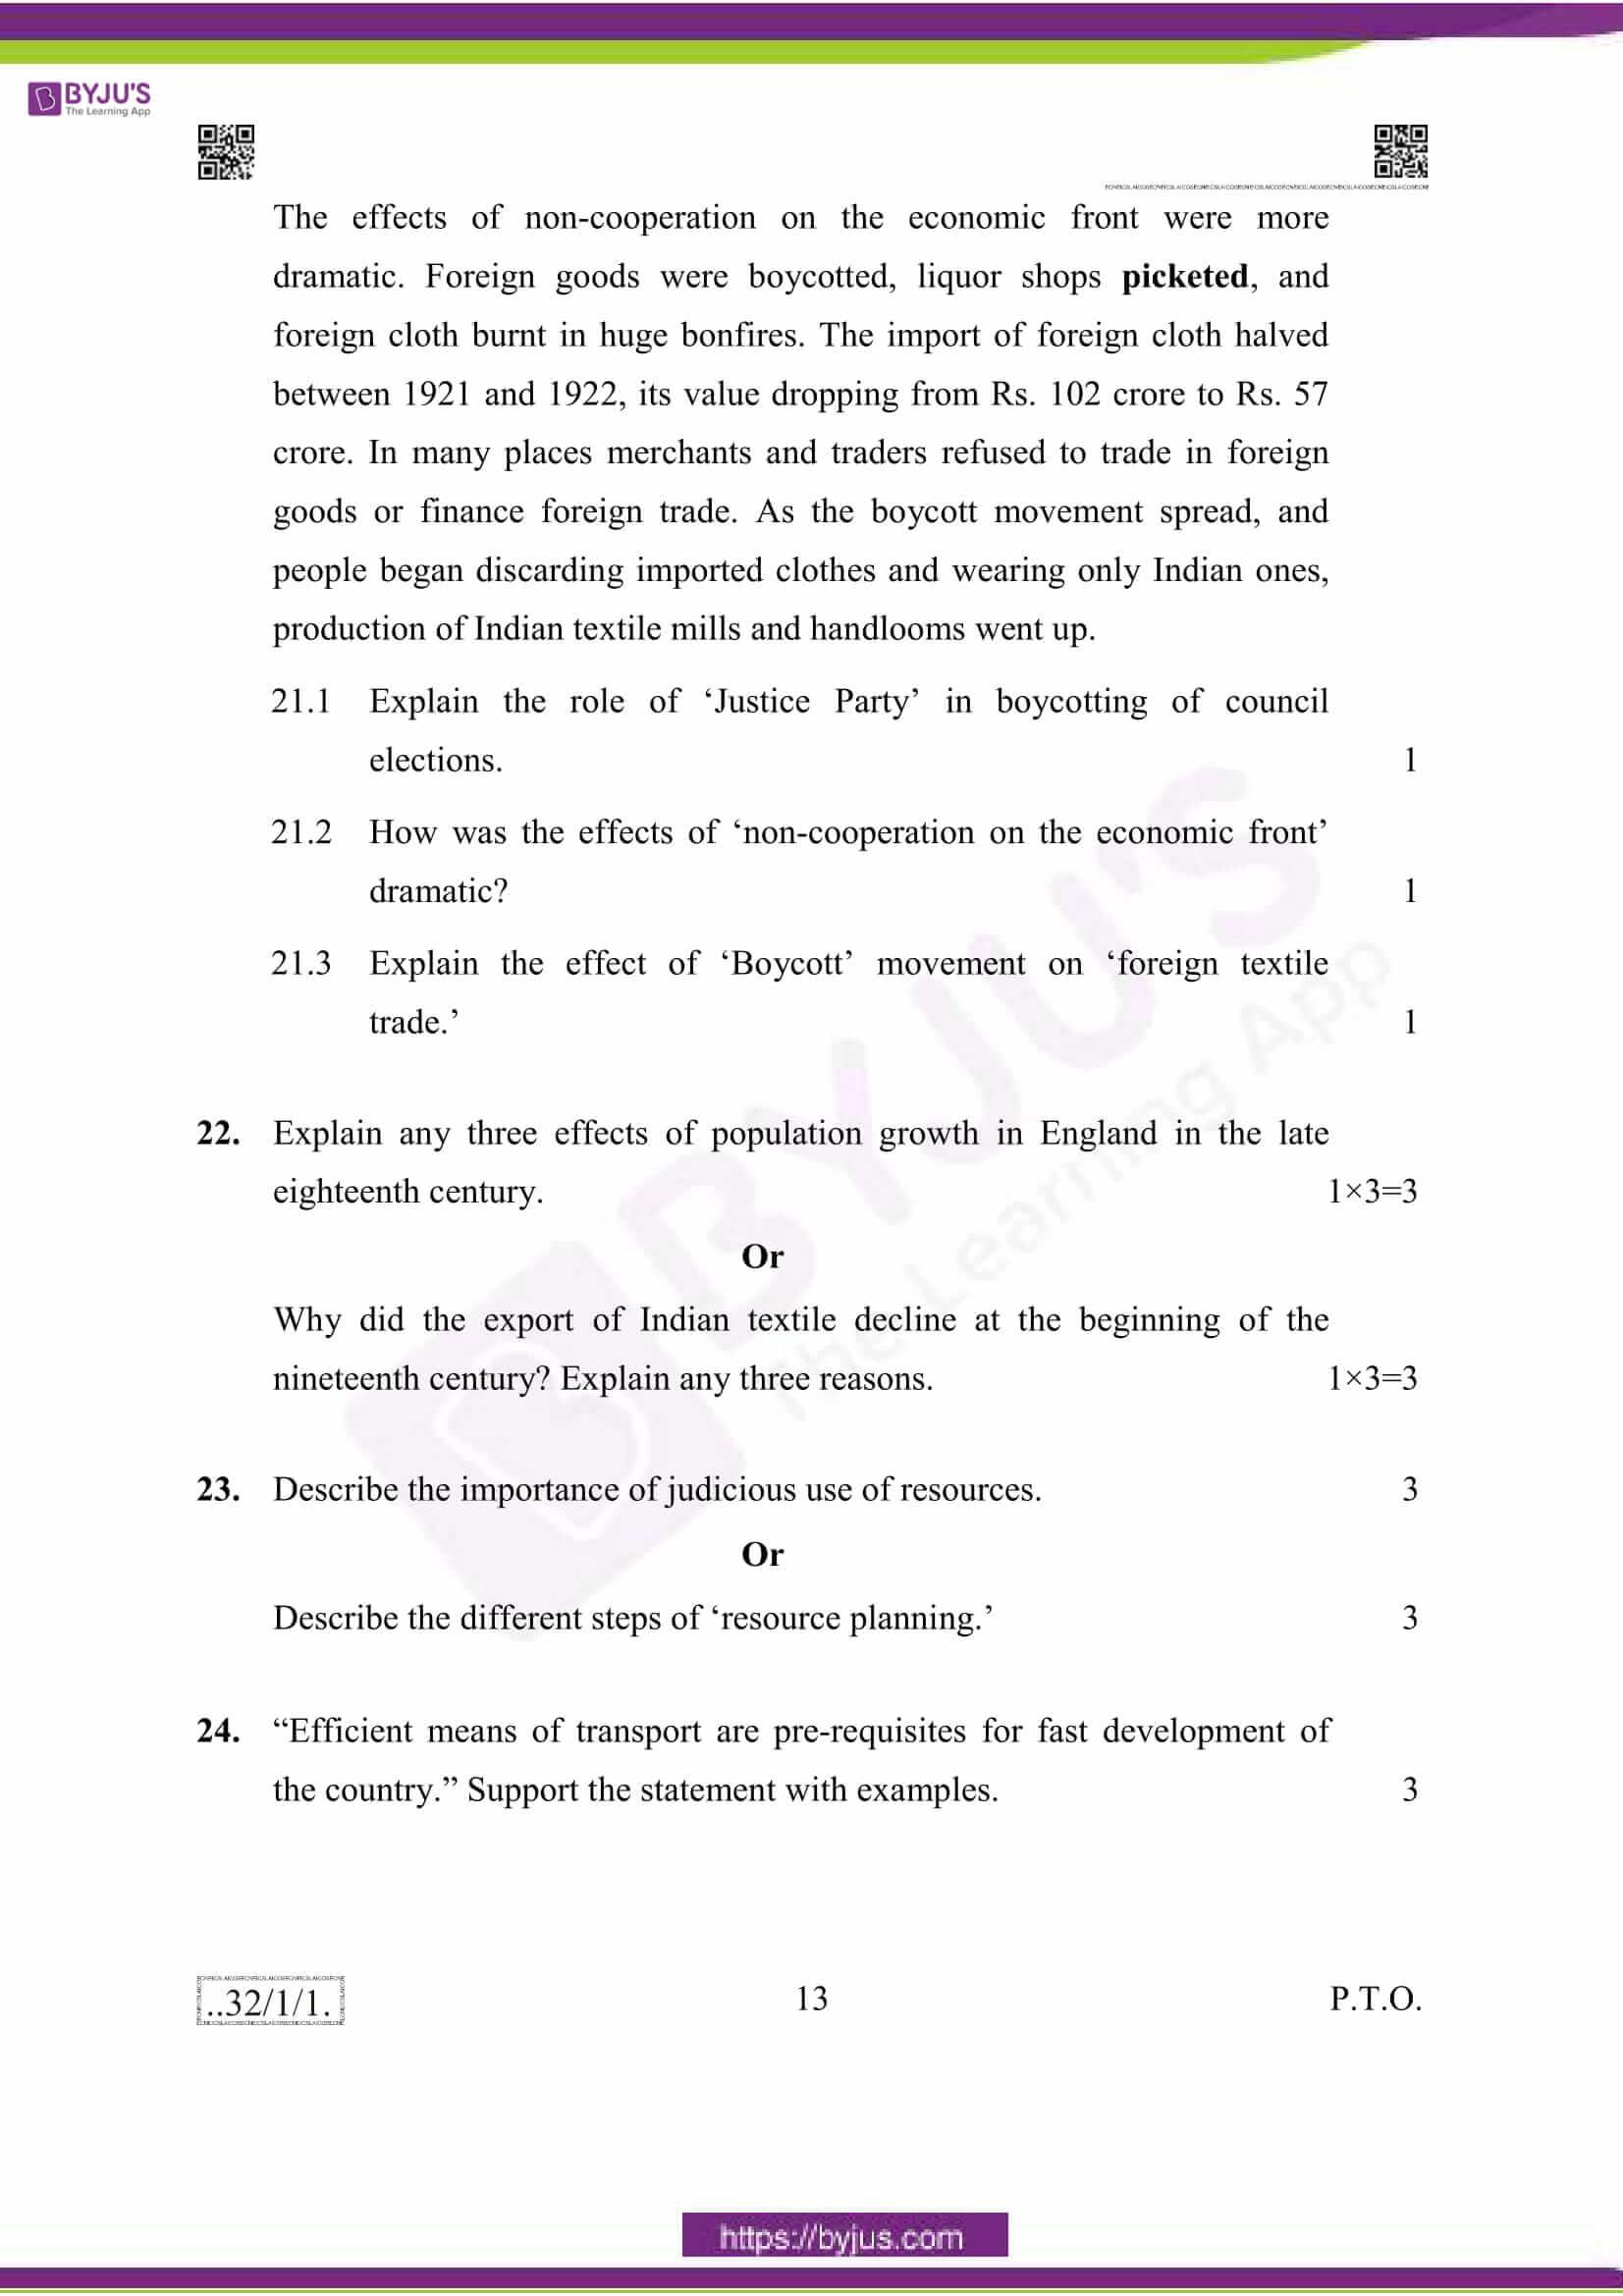 cbse class 10 social science question paper 2020 13